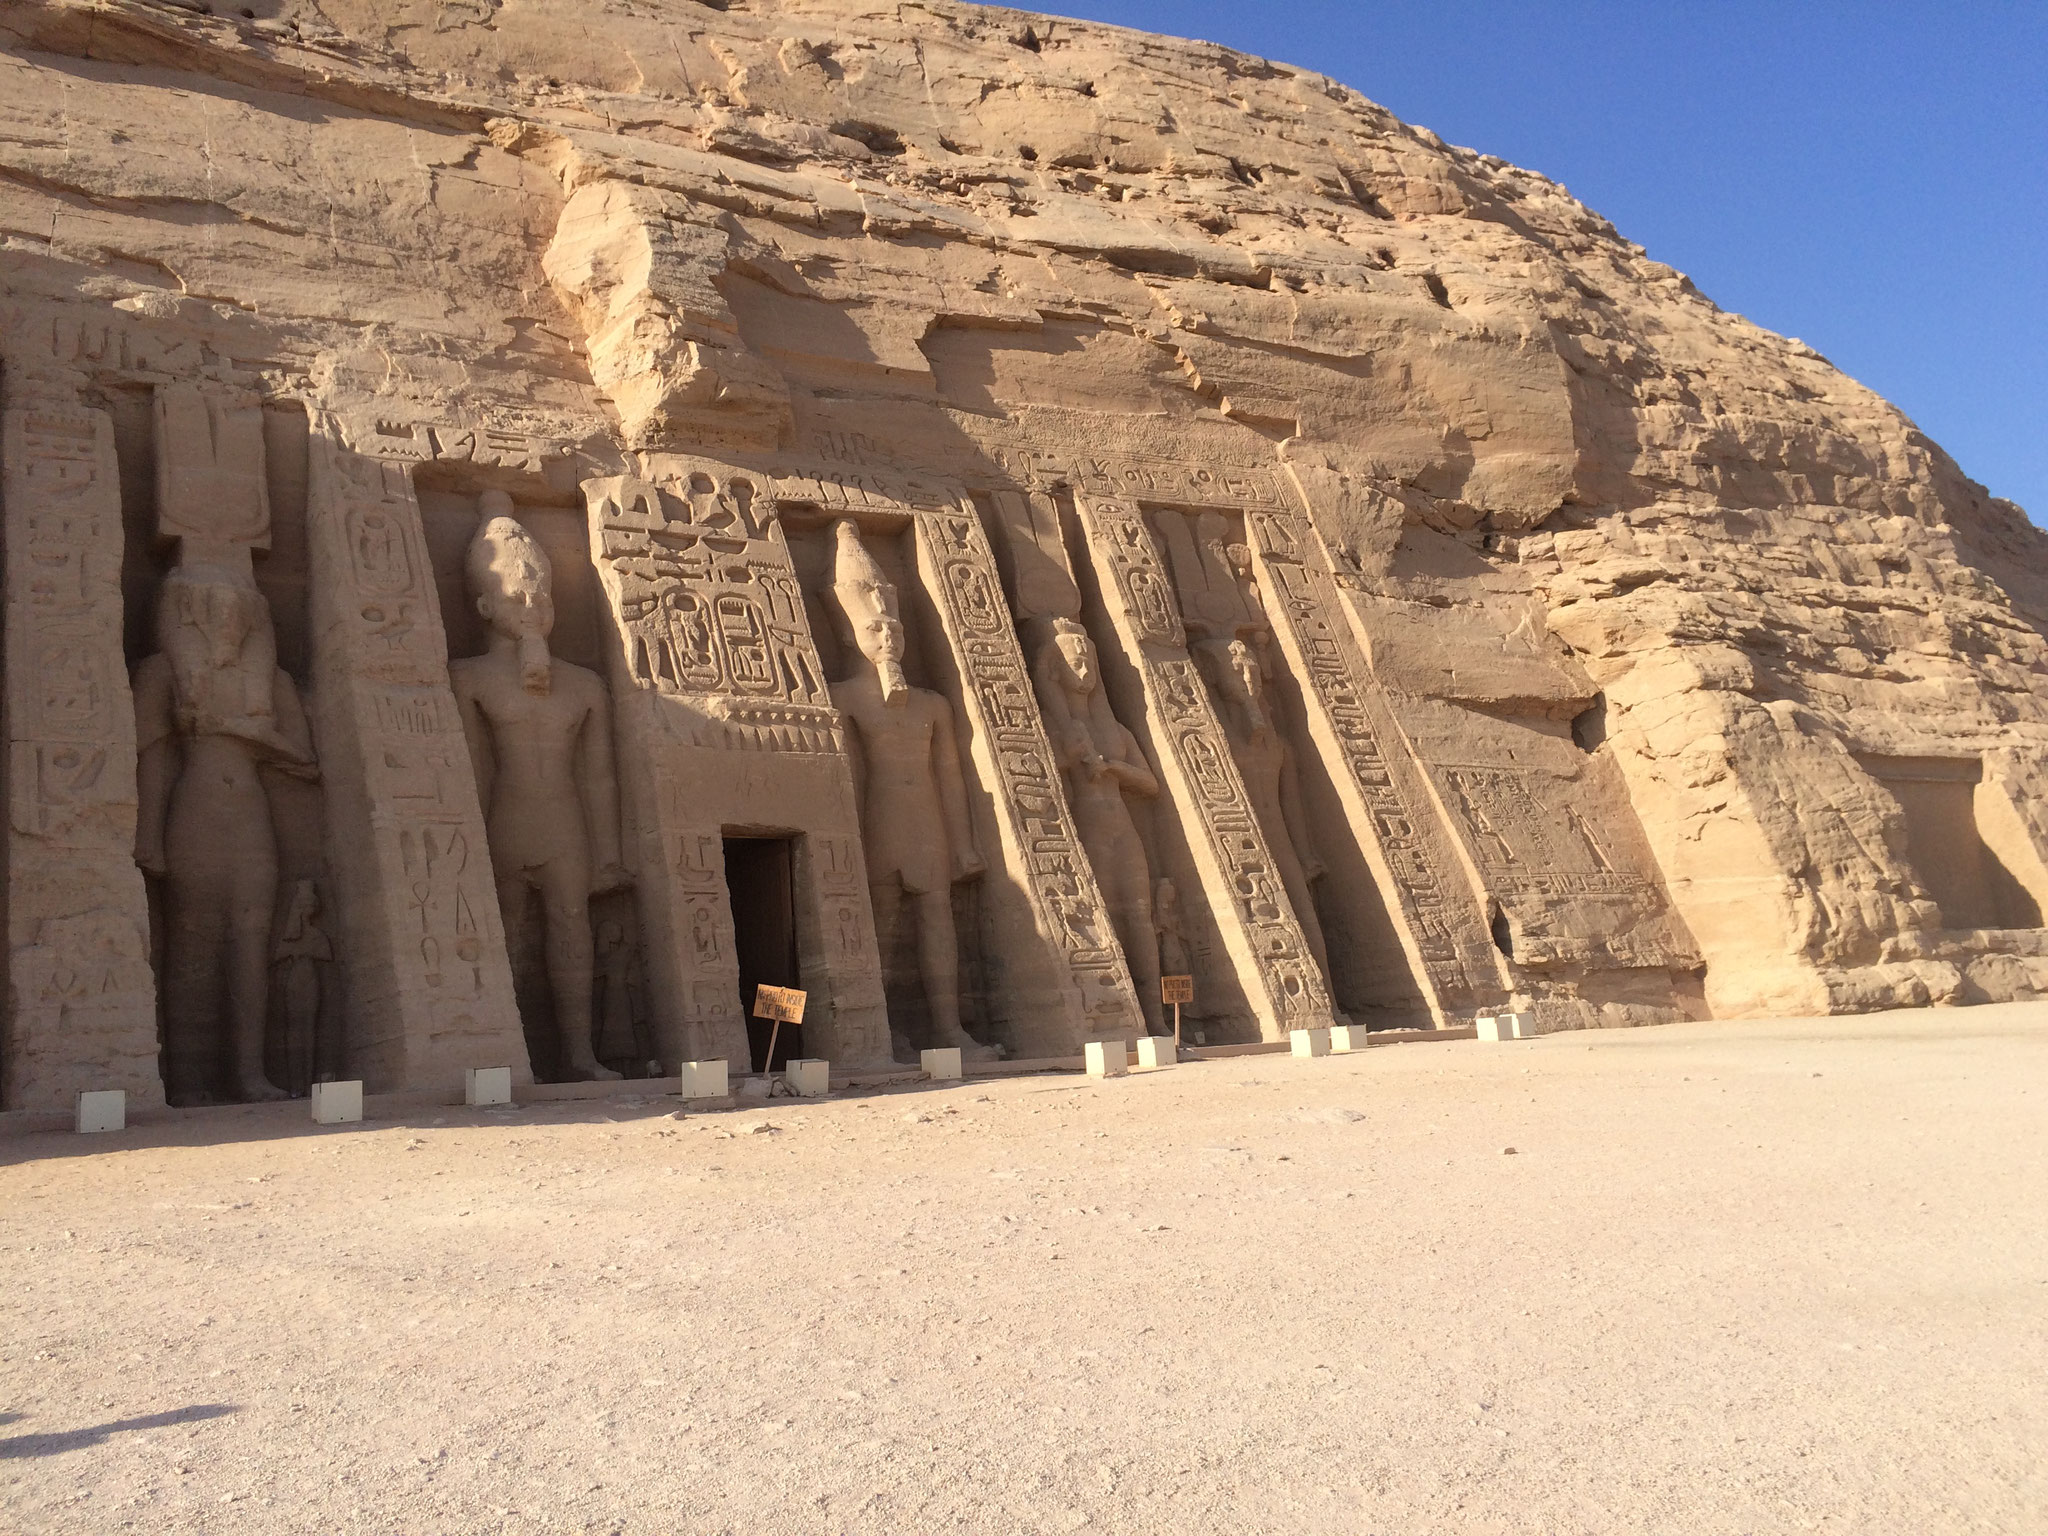 Nerfertari temple